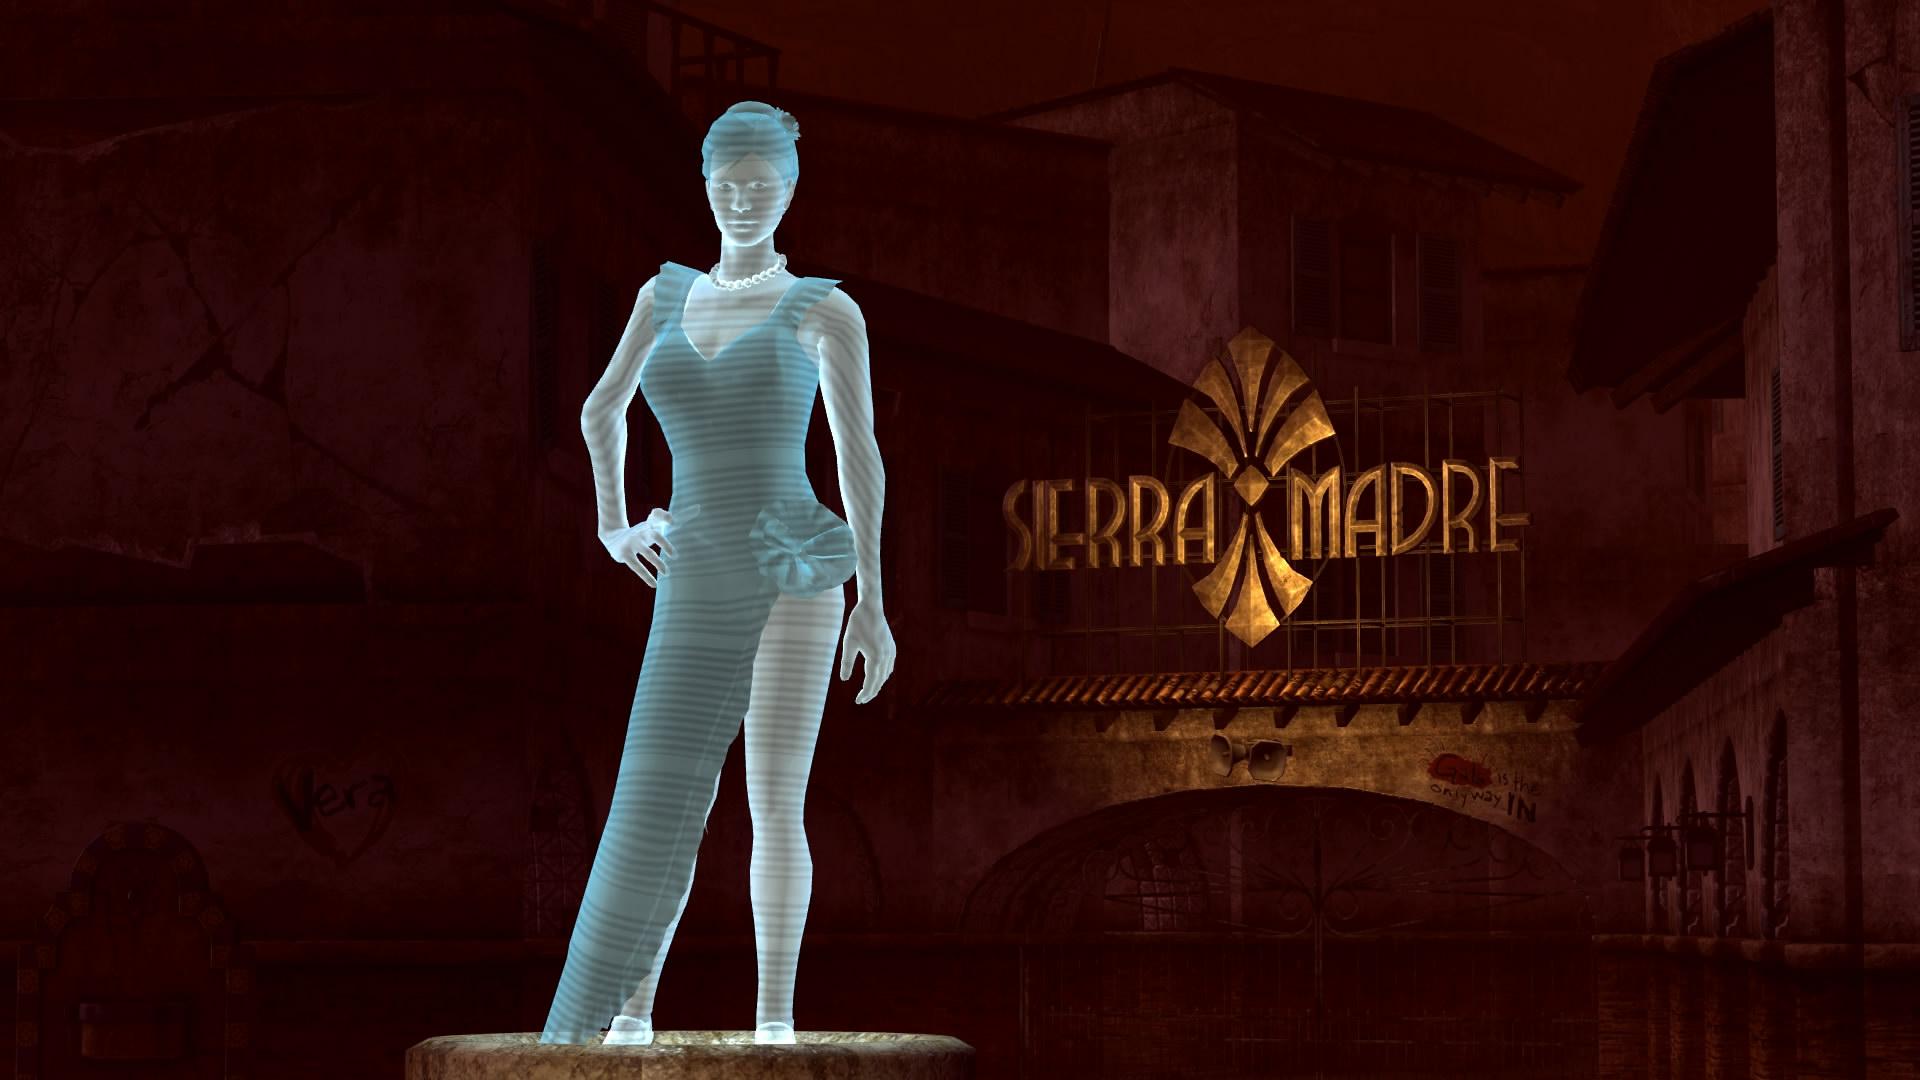 3d Hologram Wallpaper App Fallout New Vegas Sierra Madre Dreamscene By Droot1986 On